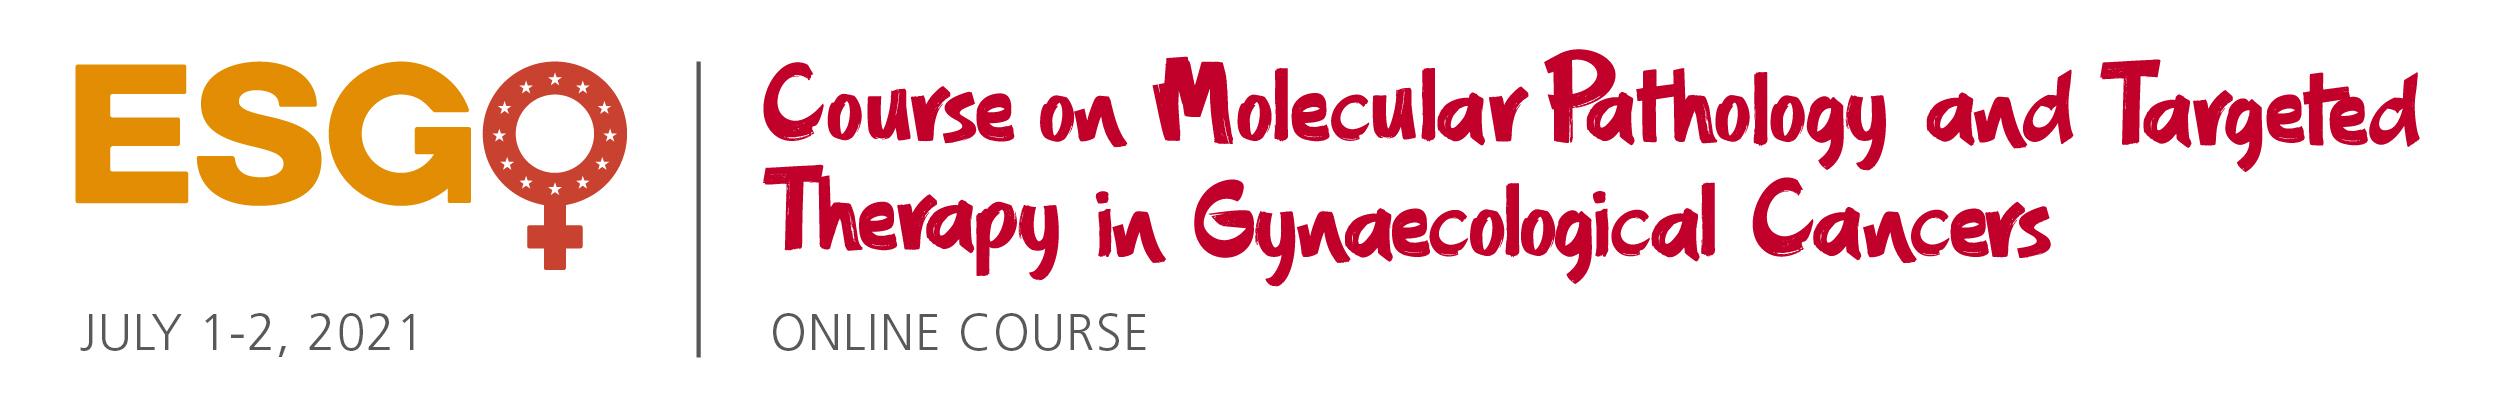 Molecular_Pathology_ONLINE